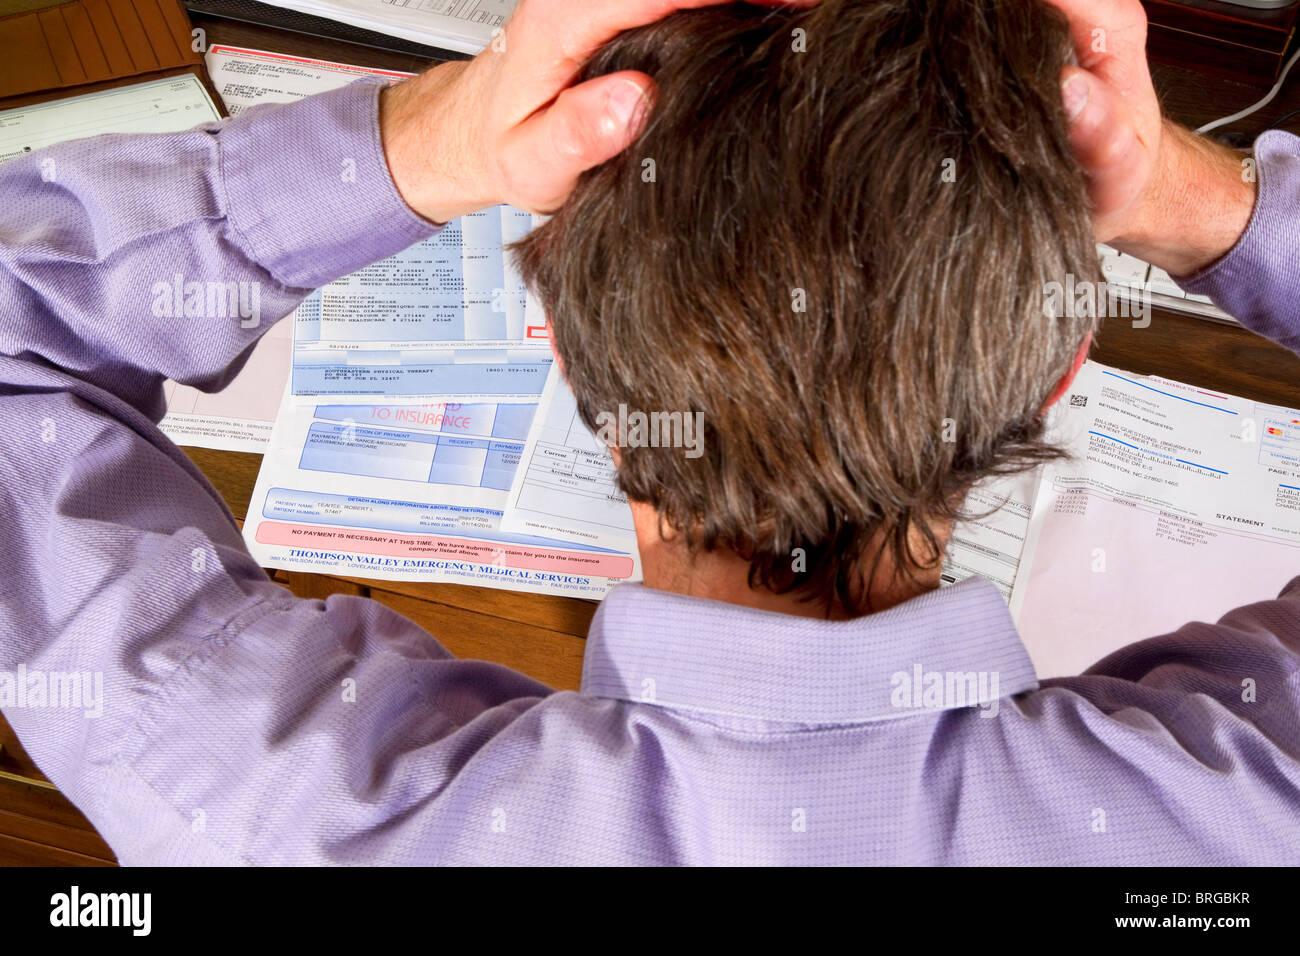 Frustrated man paying bills doing paperwork finances - Stock Image